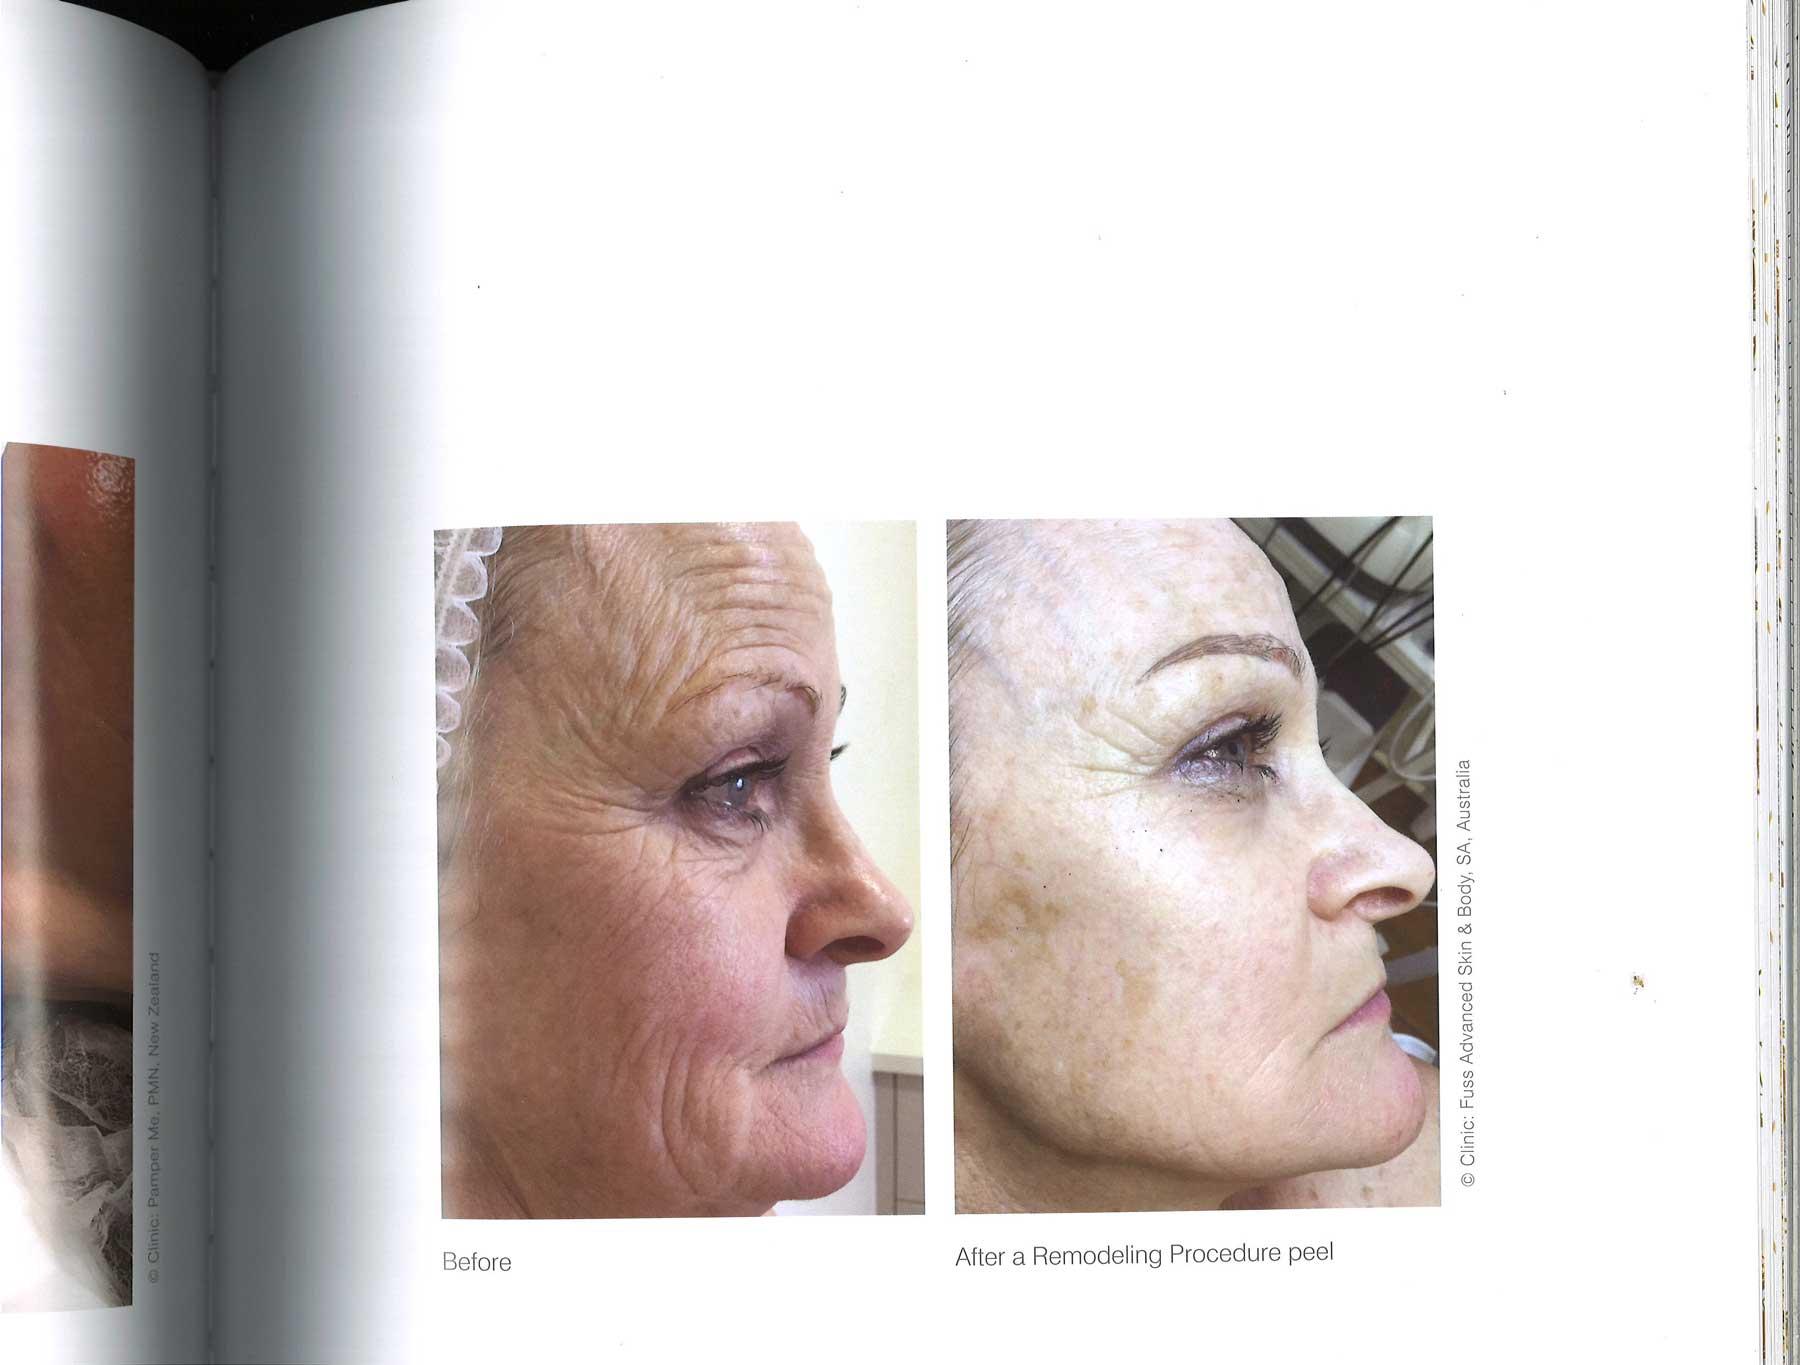 Home Page - DMK Skincare rebuilding skin, rebuilding lives